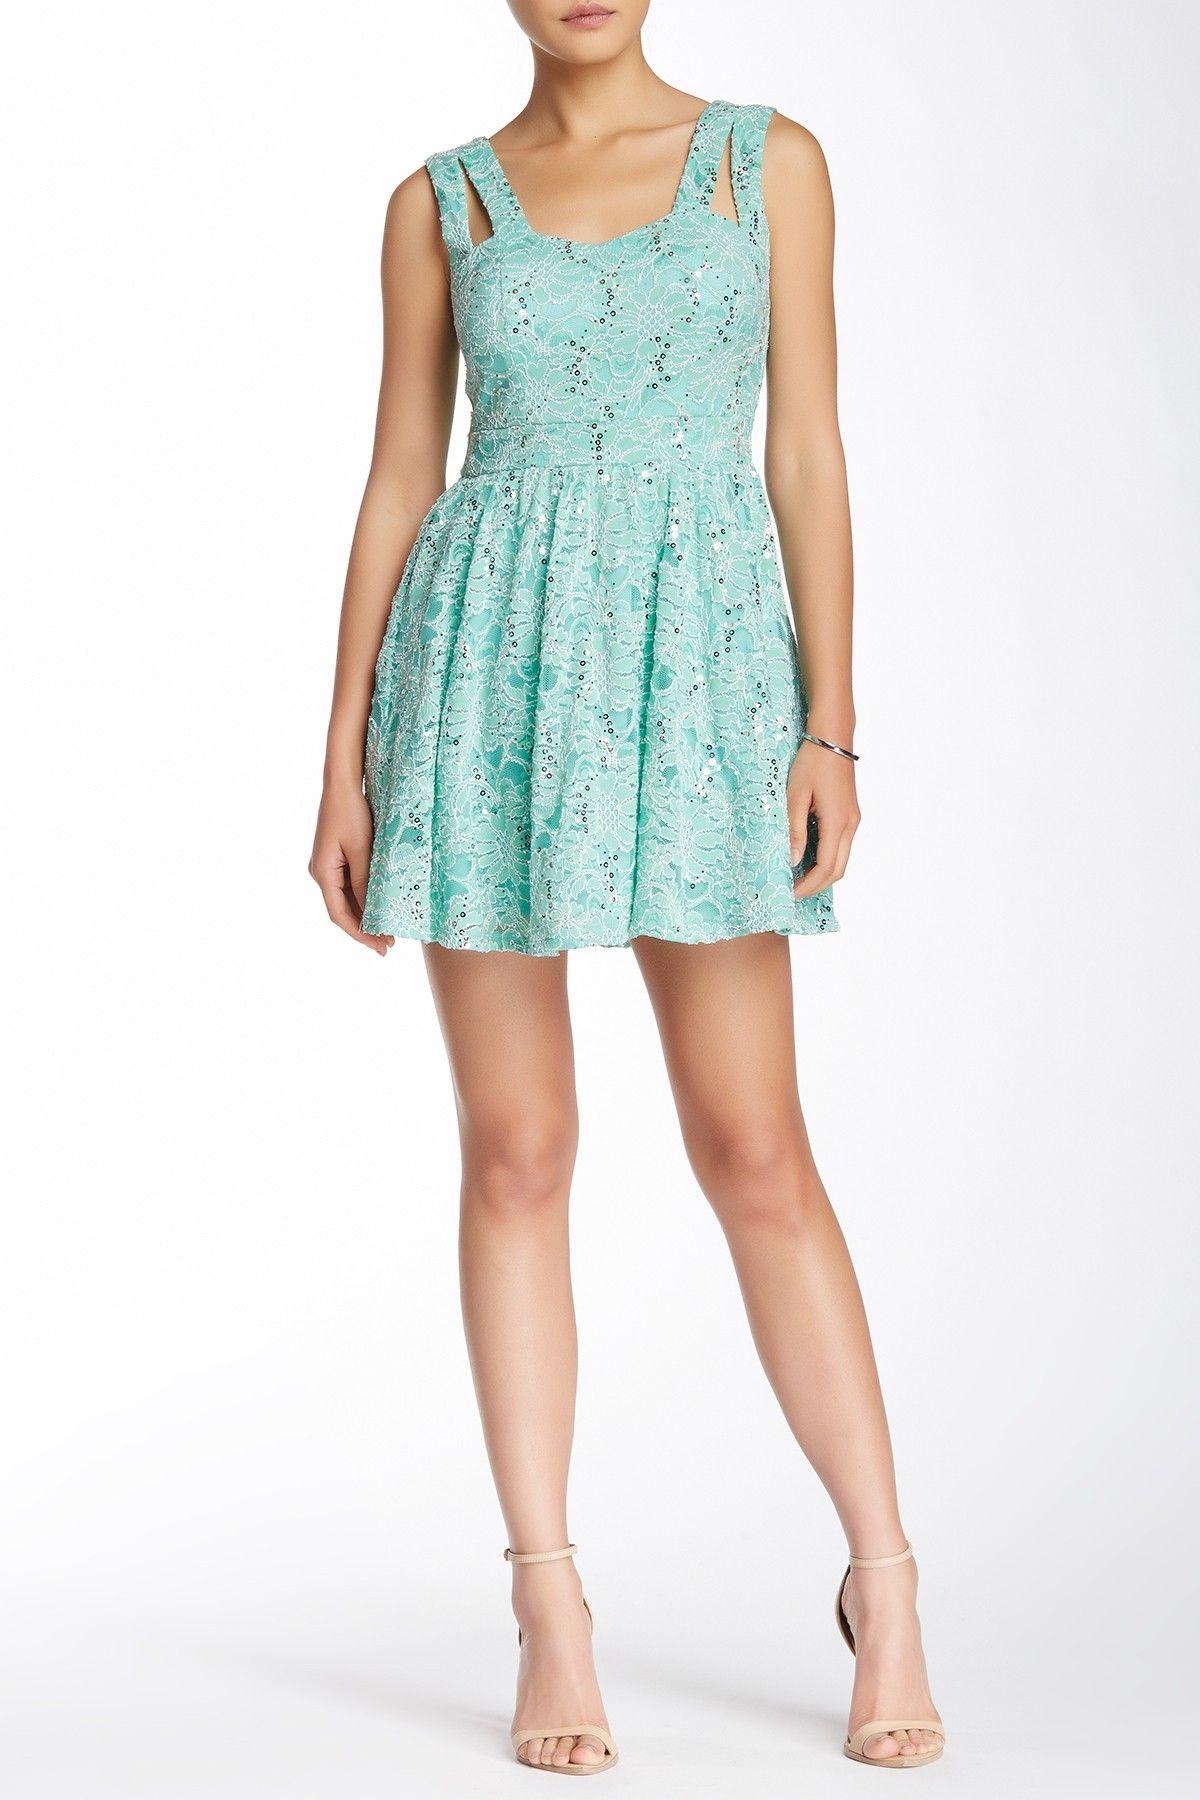 As u wish sleeveless cutout square lace skater prom dress my style